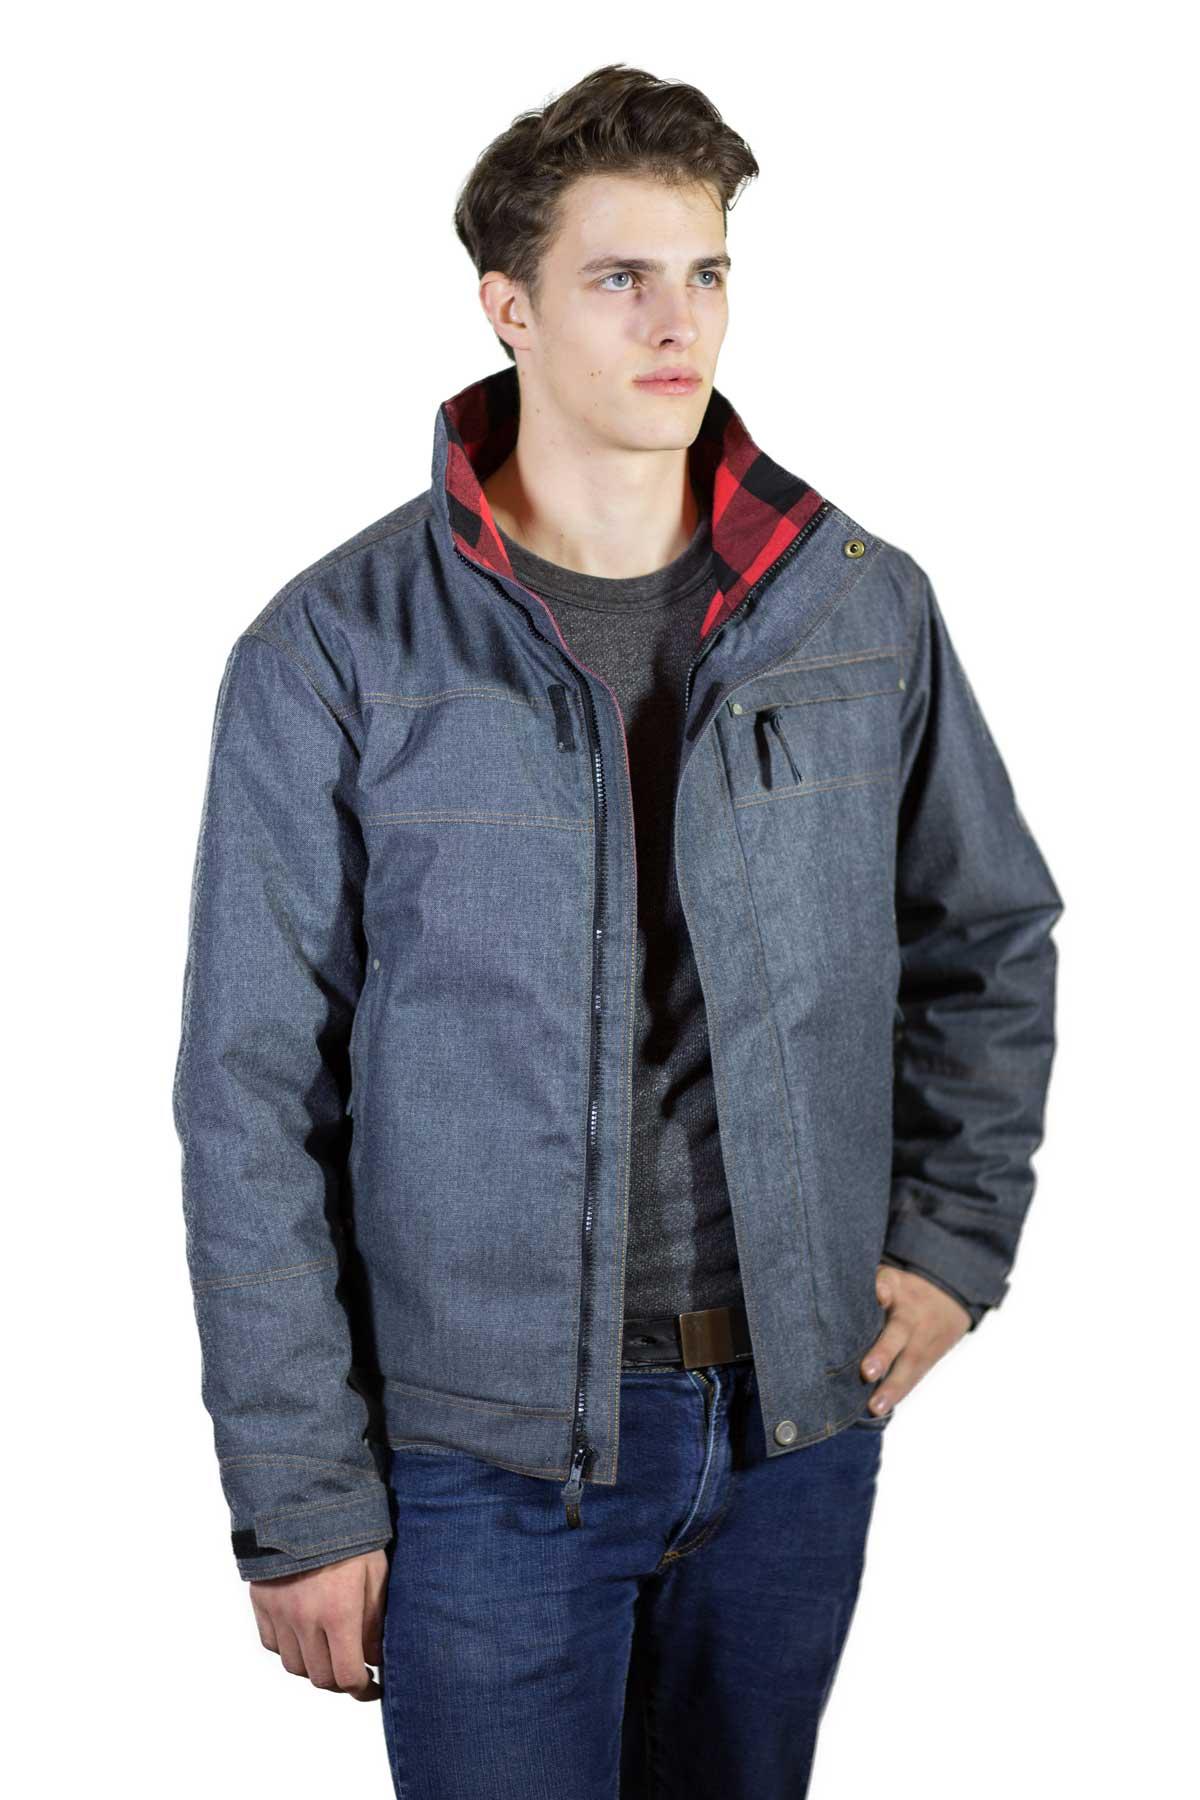 Burnside Alpha Jacket from WILD Outdoor Apparel